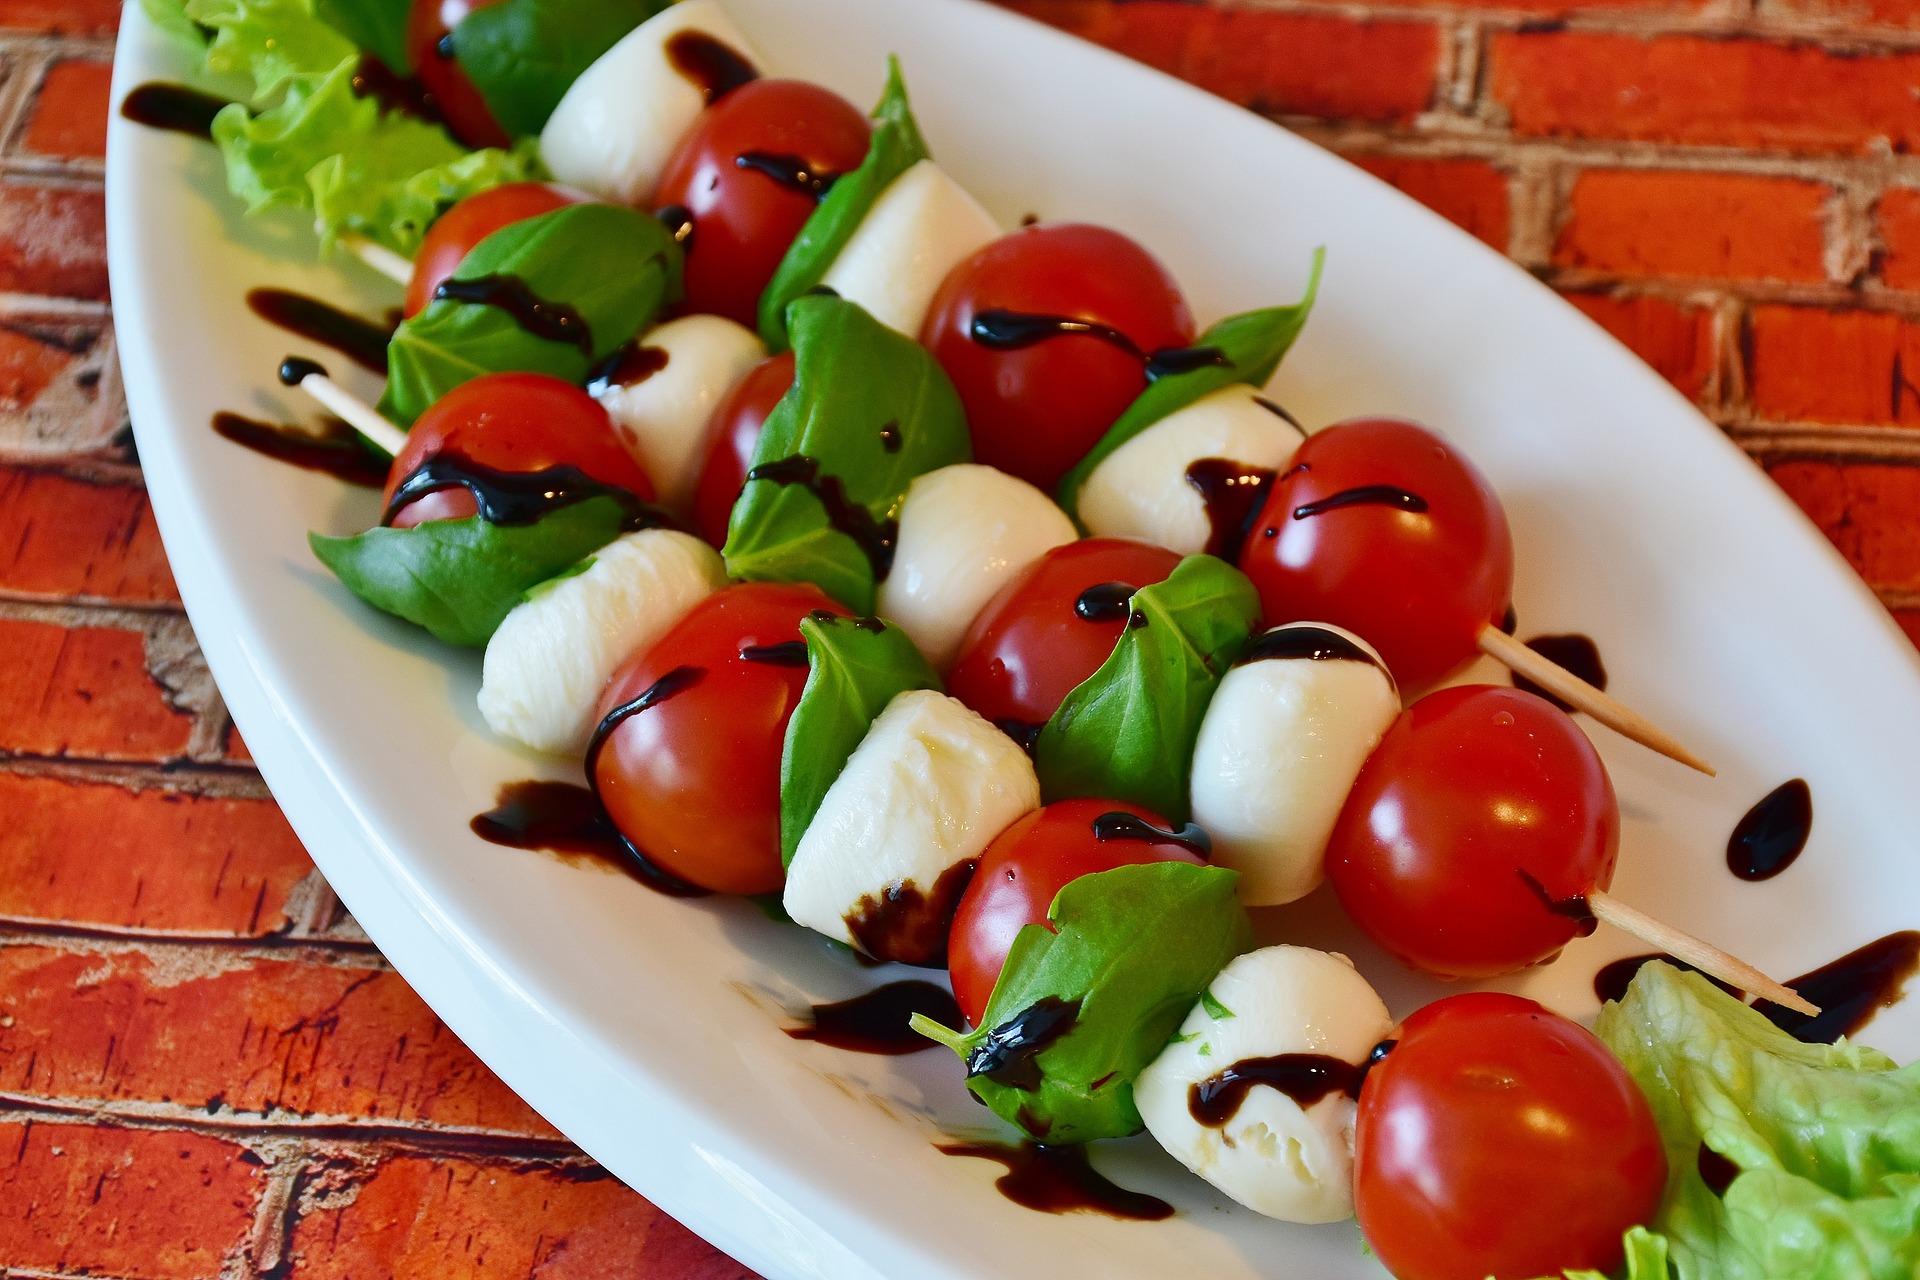 tomato-mozzarella-2367016_1920.jpg